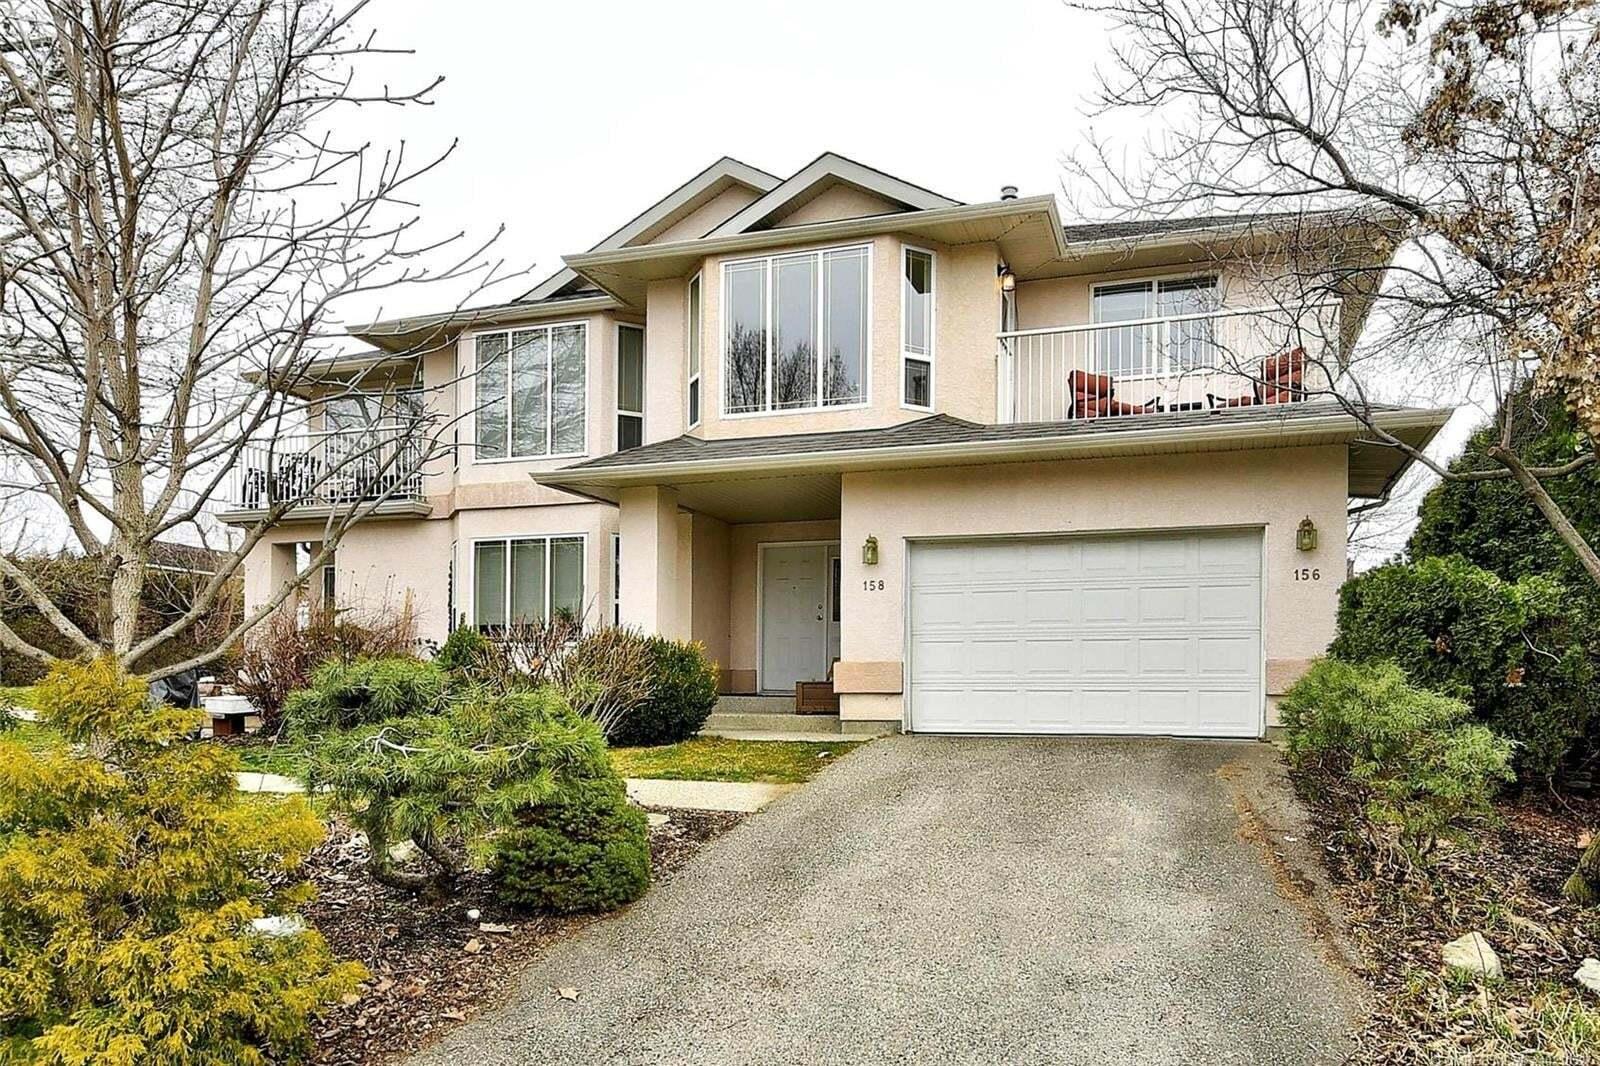 Townhouse for sale at 158 Wyndham Cres Kelowna British Columbia - MLS: 10210527